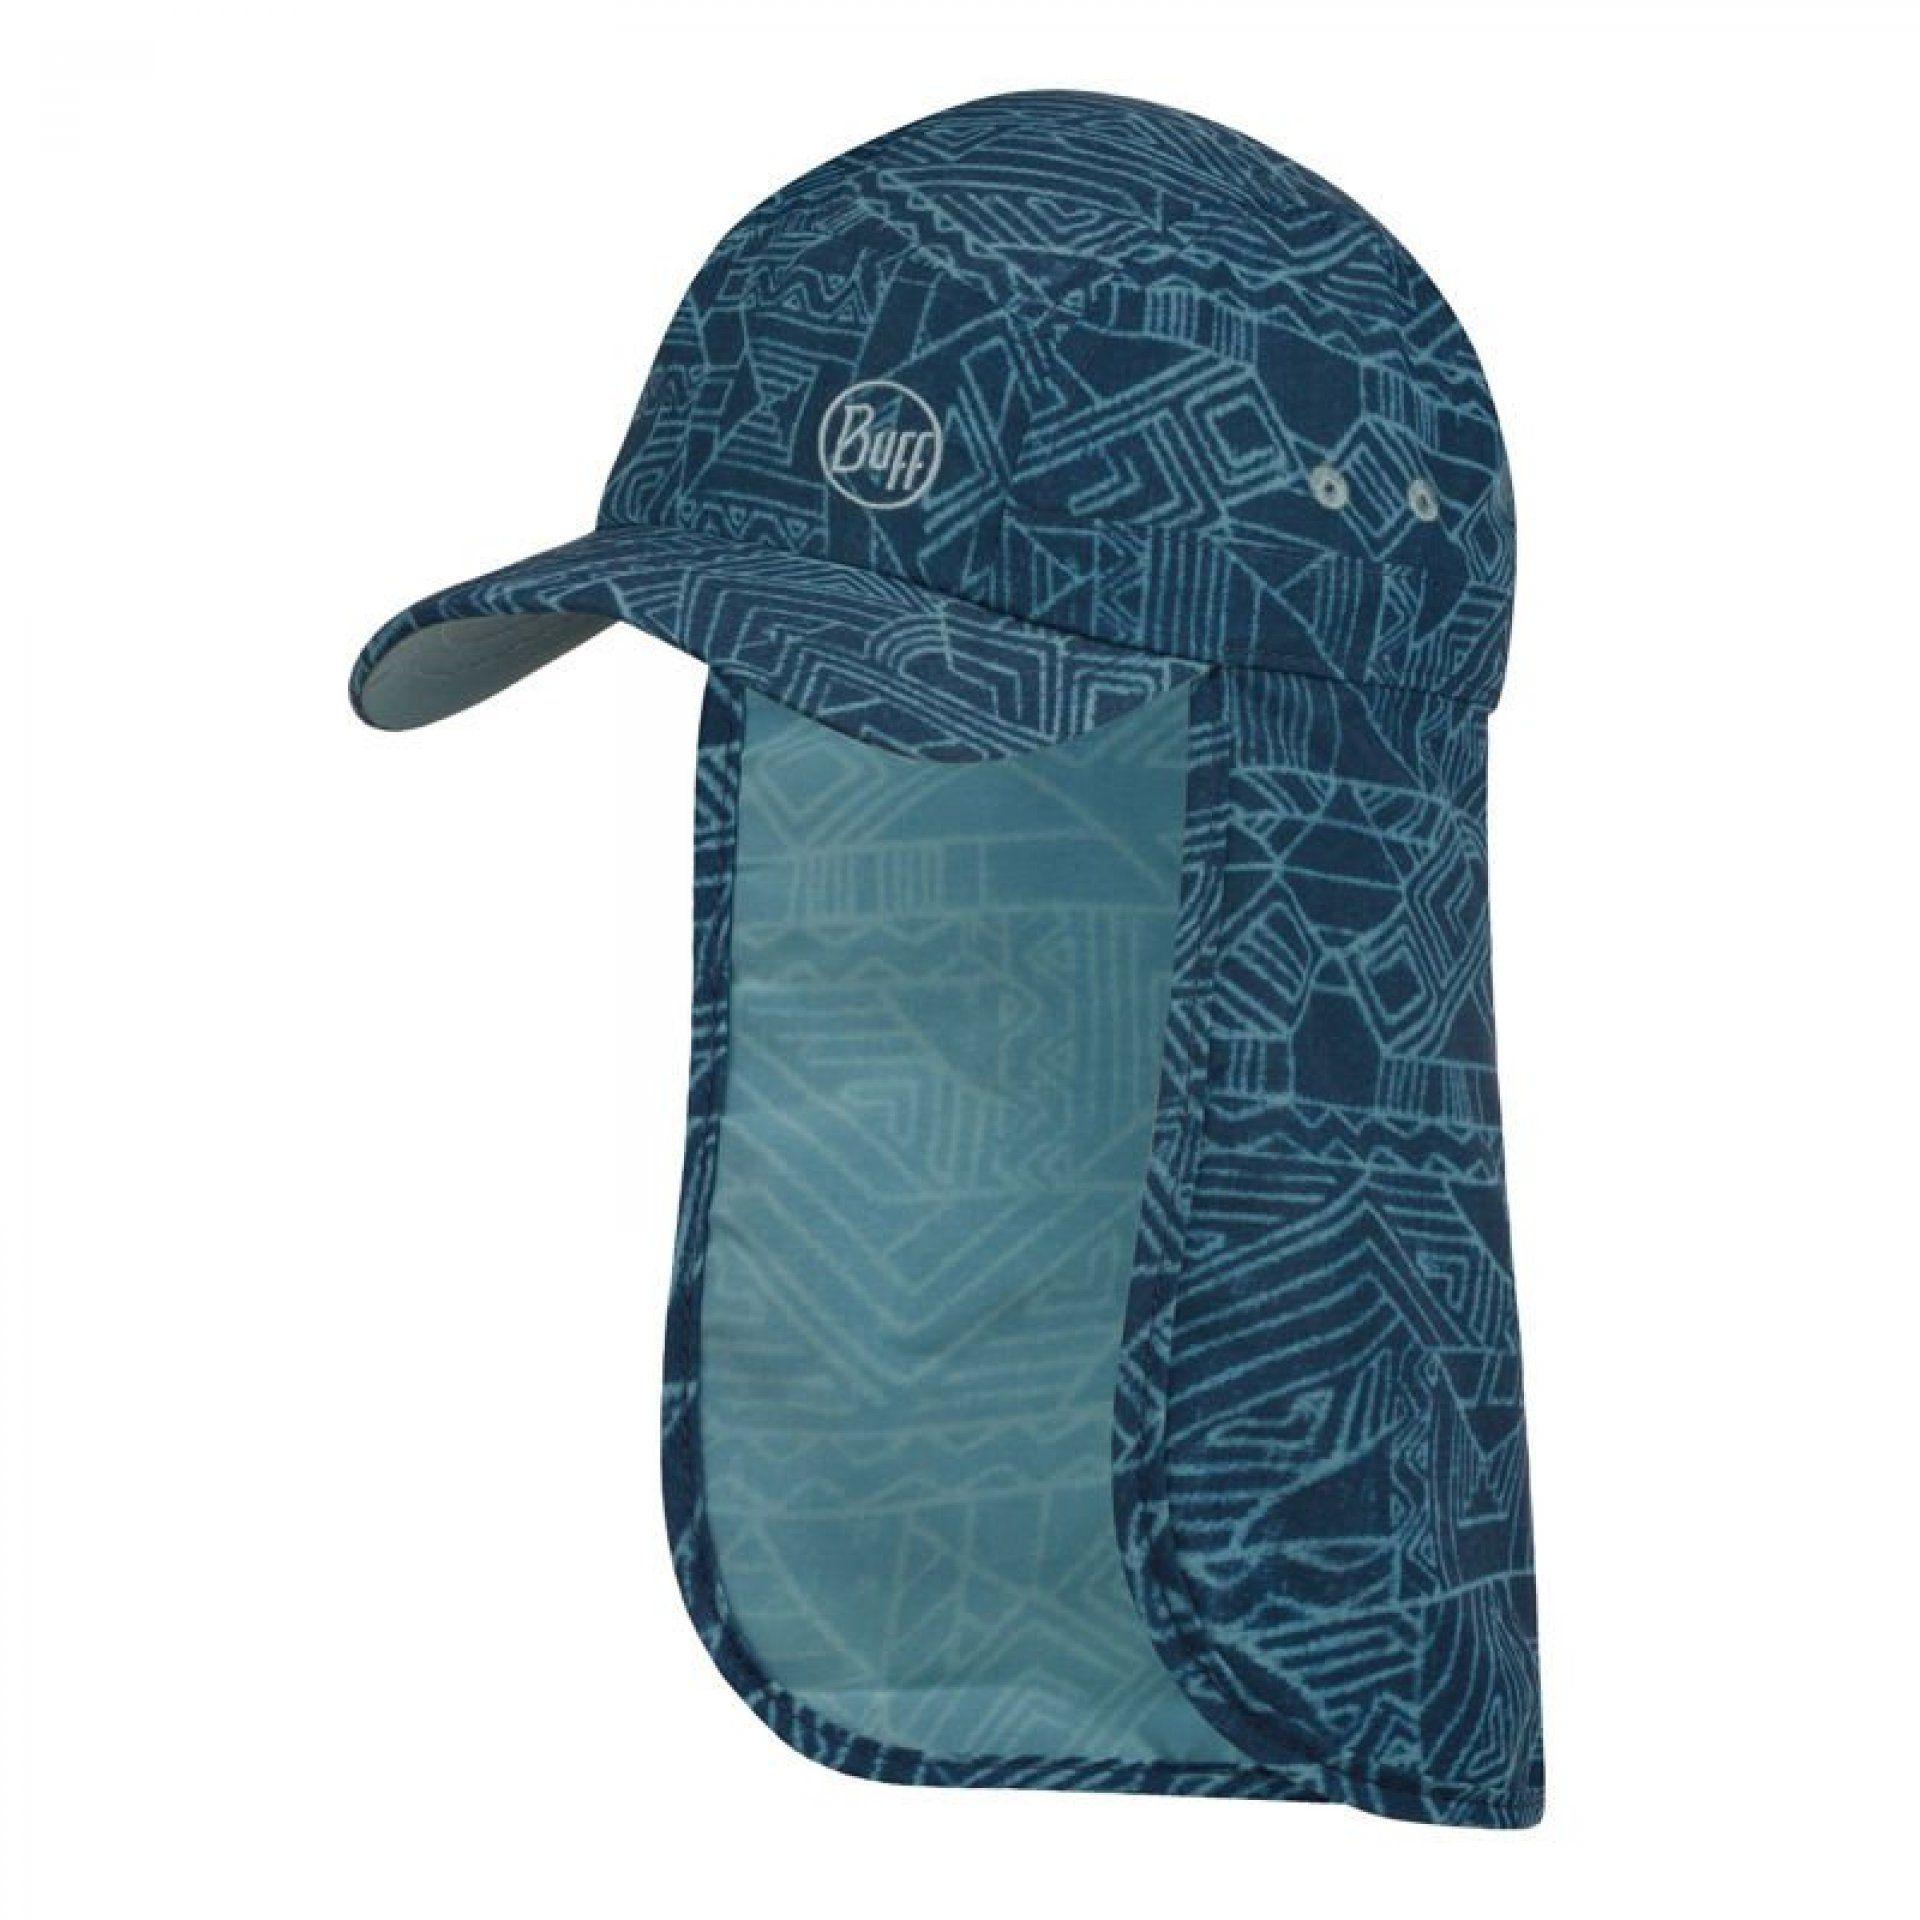 CZAPKA BUFF BIMINI CAP JR KASAI NIGHT BLUE